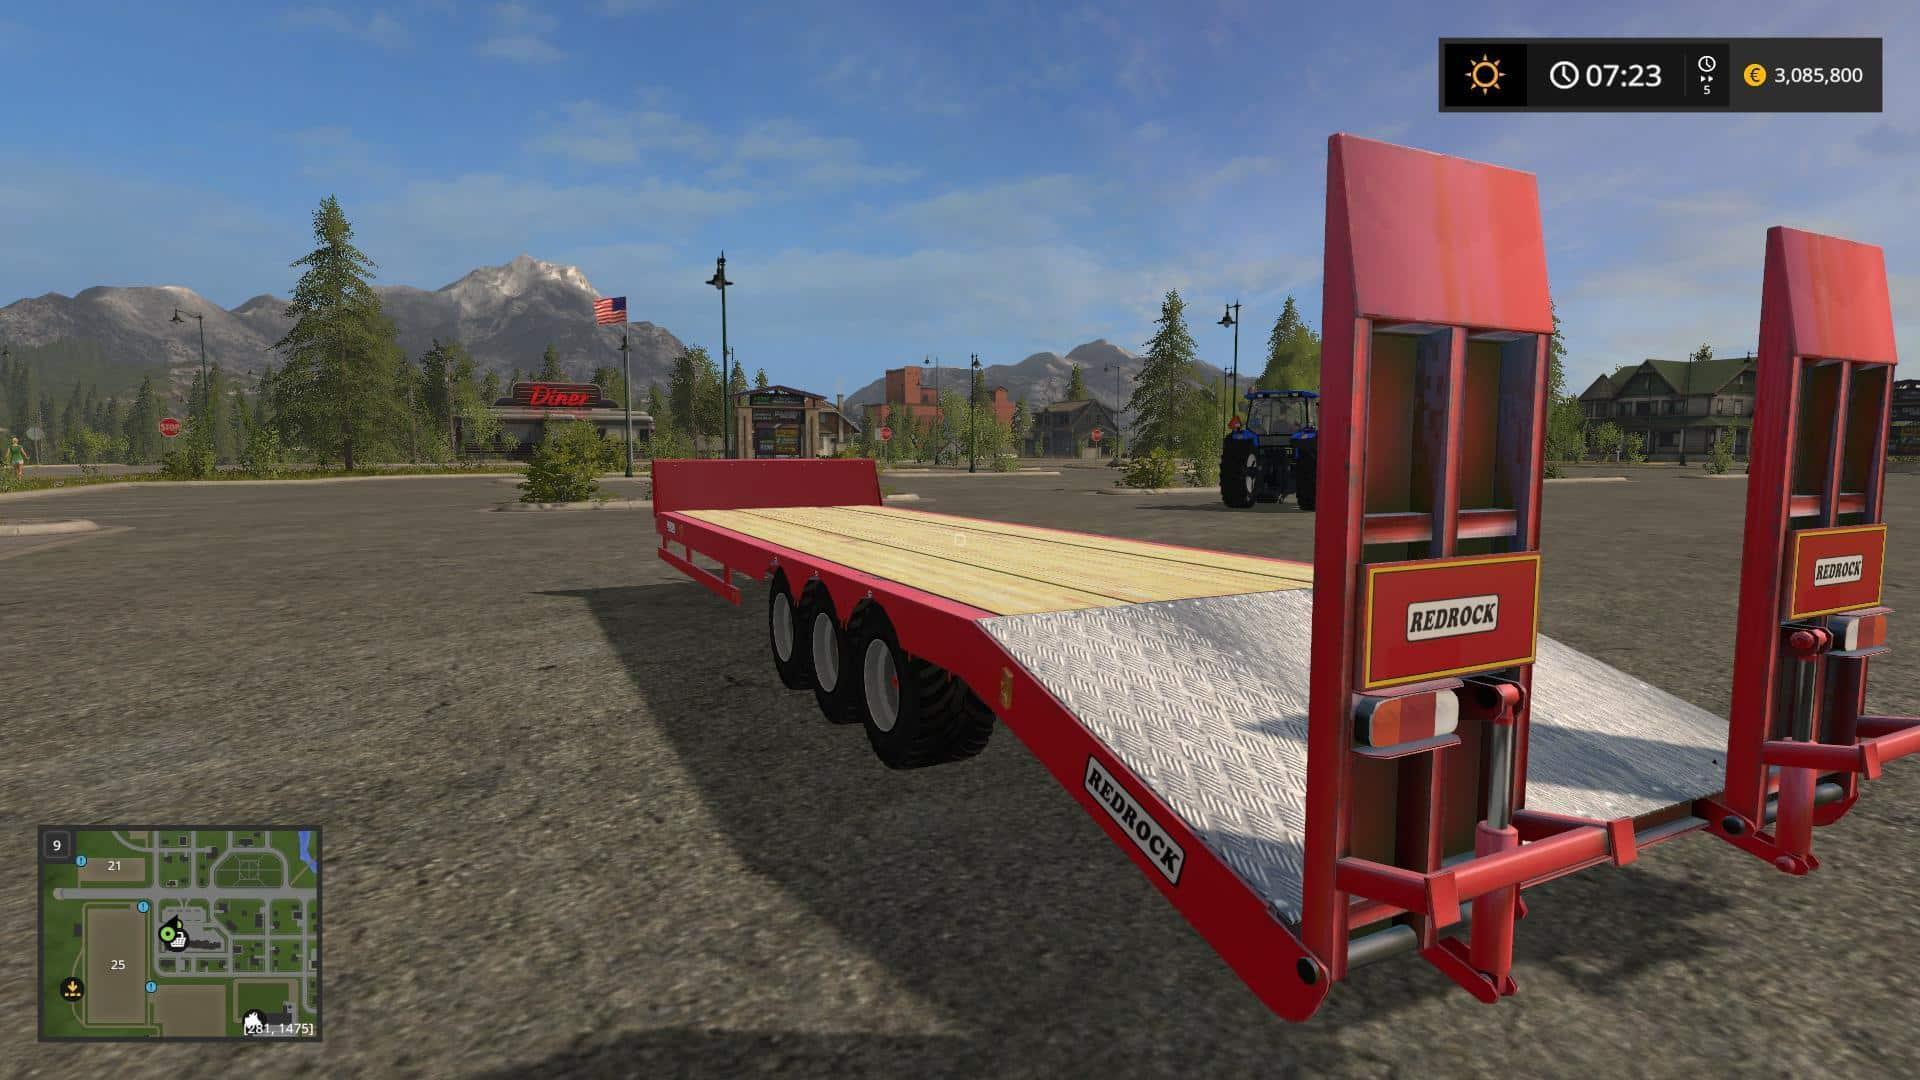 Redrock bale trailer convert v1.0